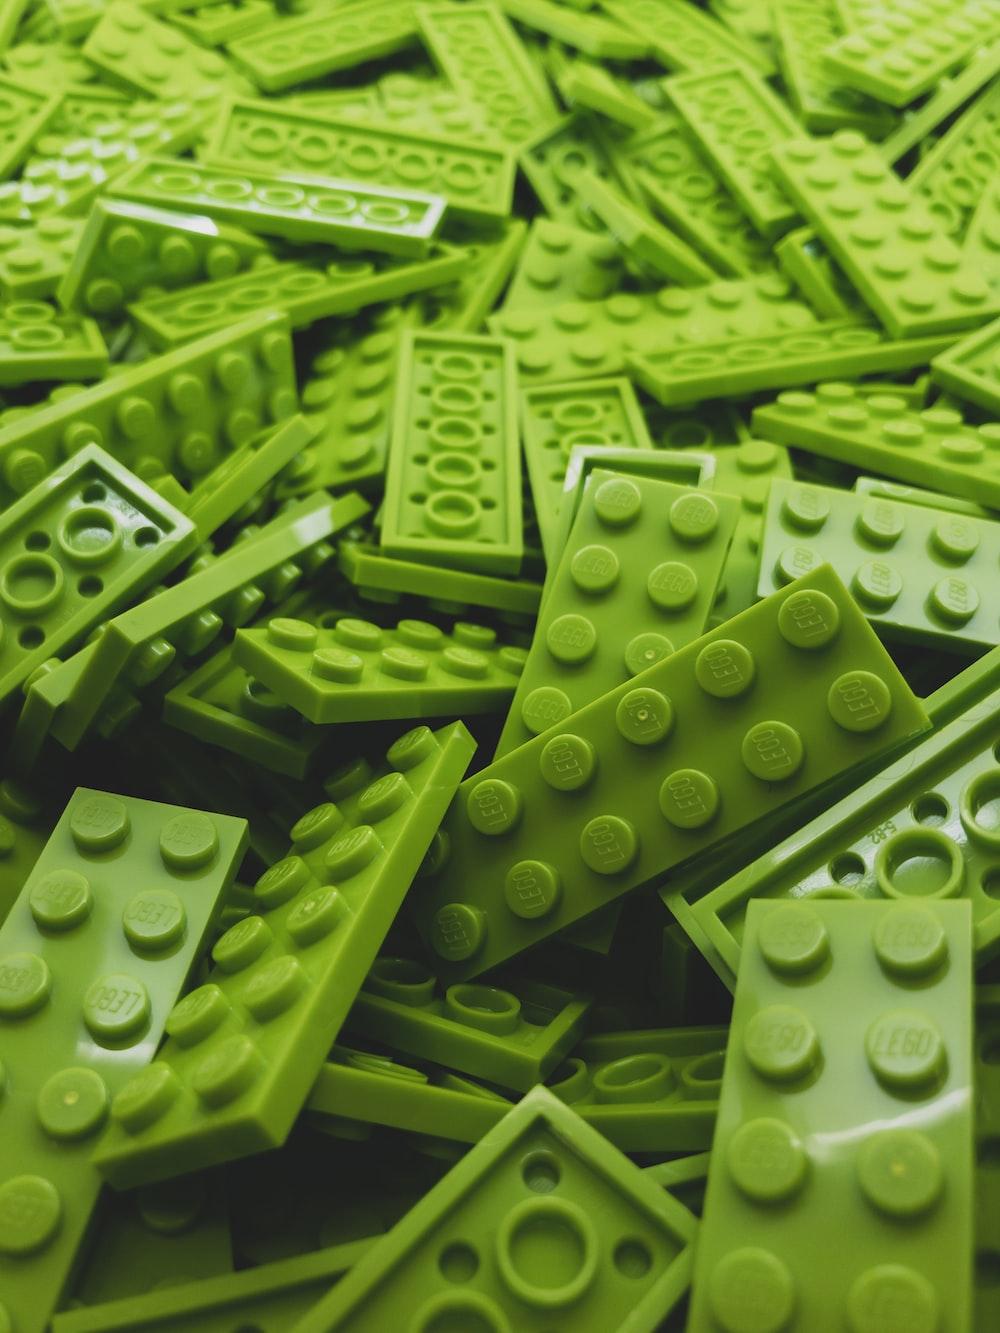 green Lego block lot